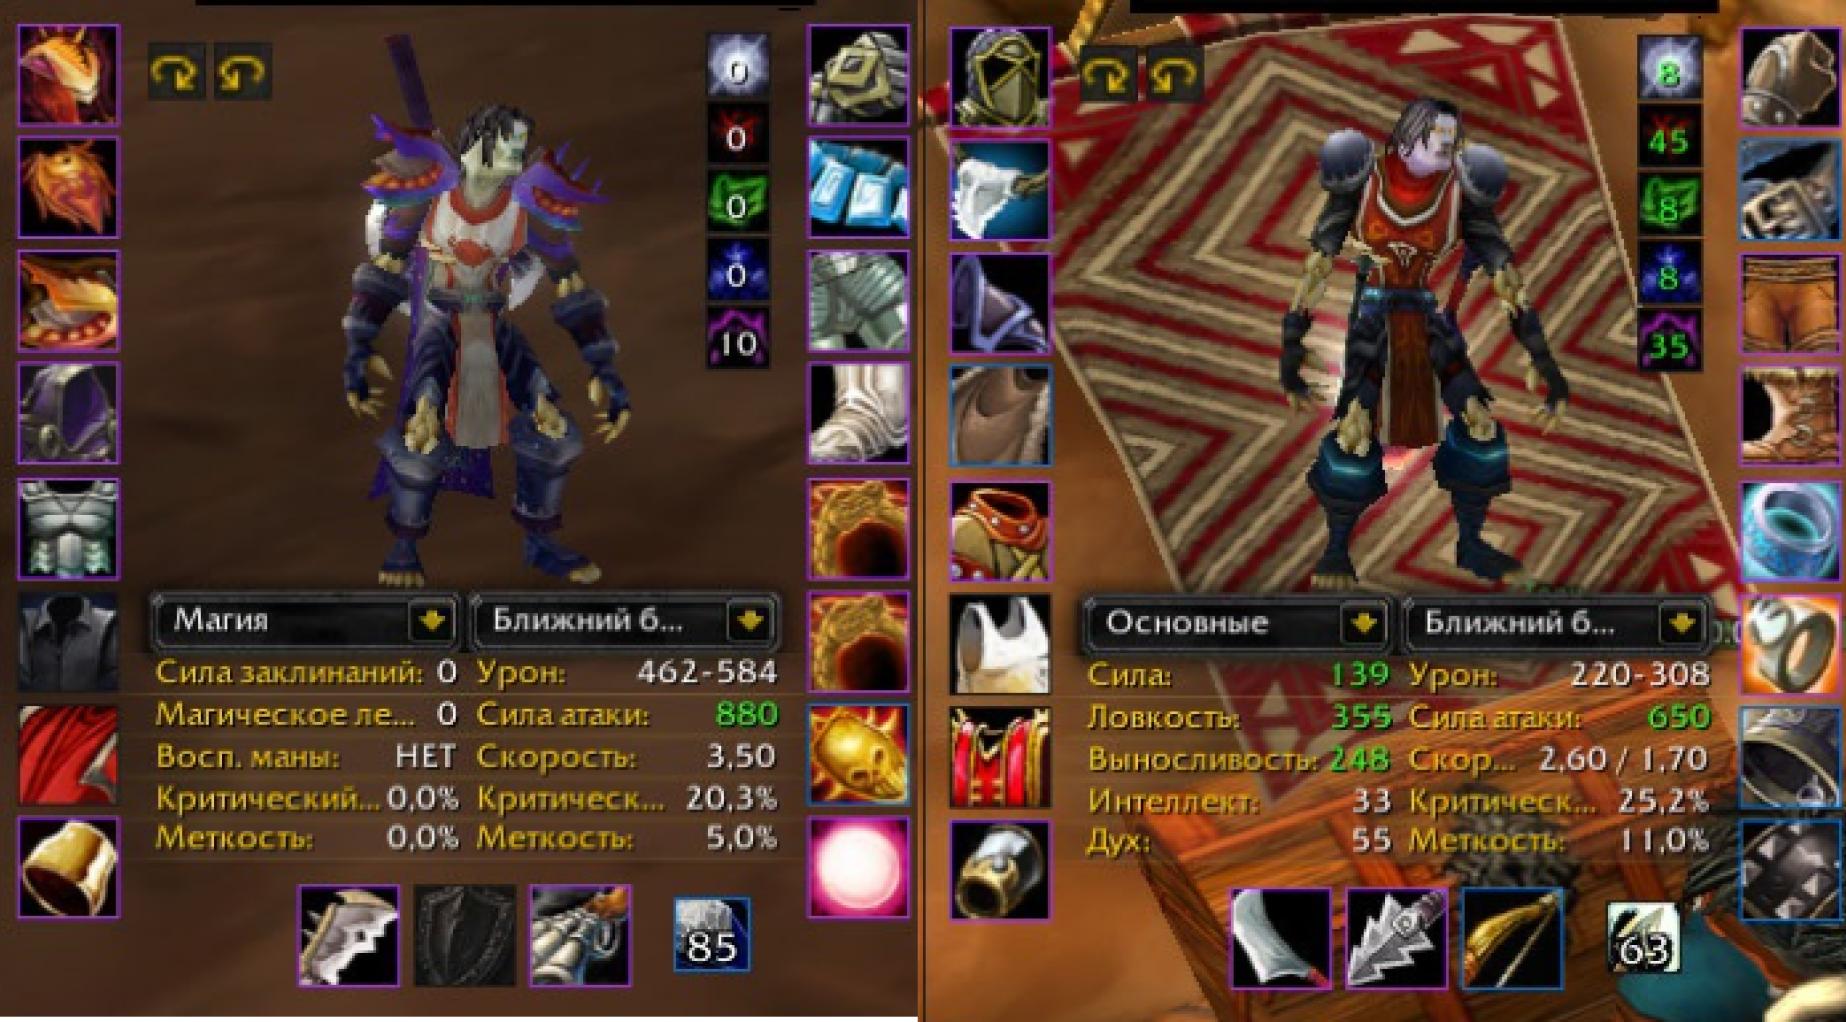 Undead male warrior Flamegor